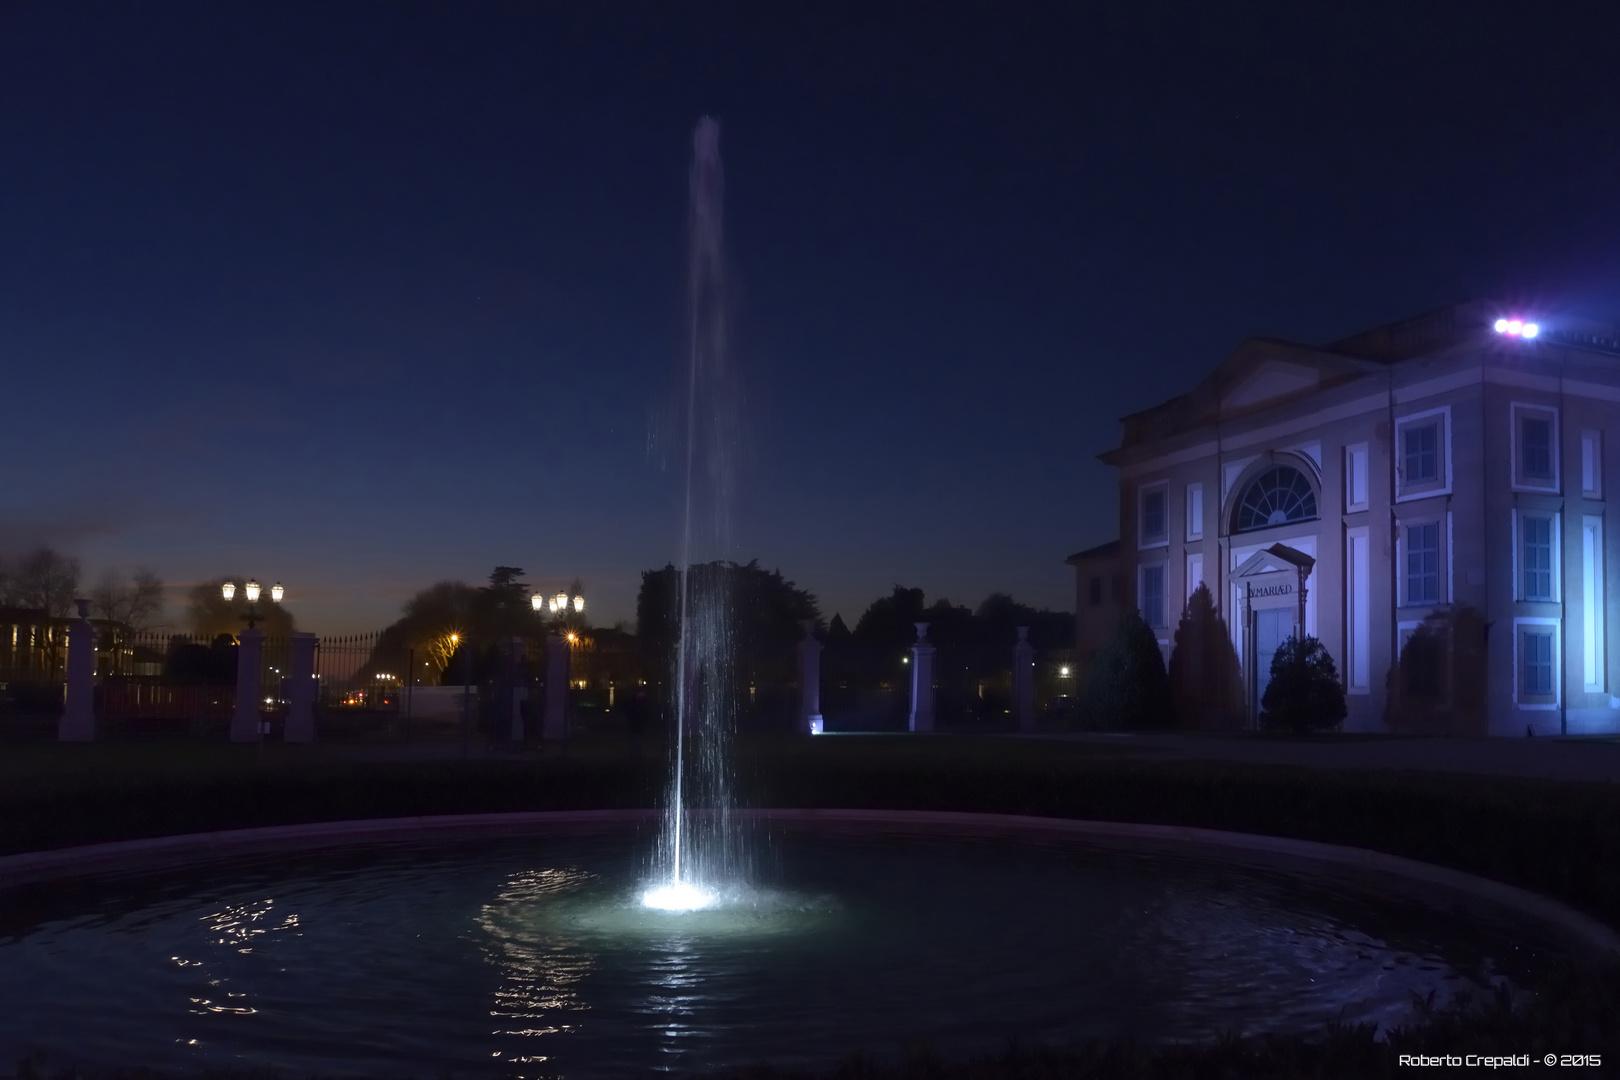 Monza, Palazzo Reale la fontana